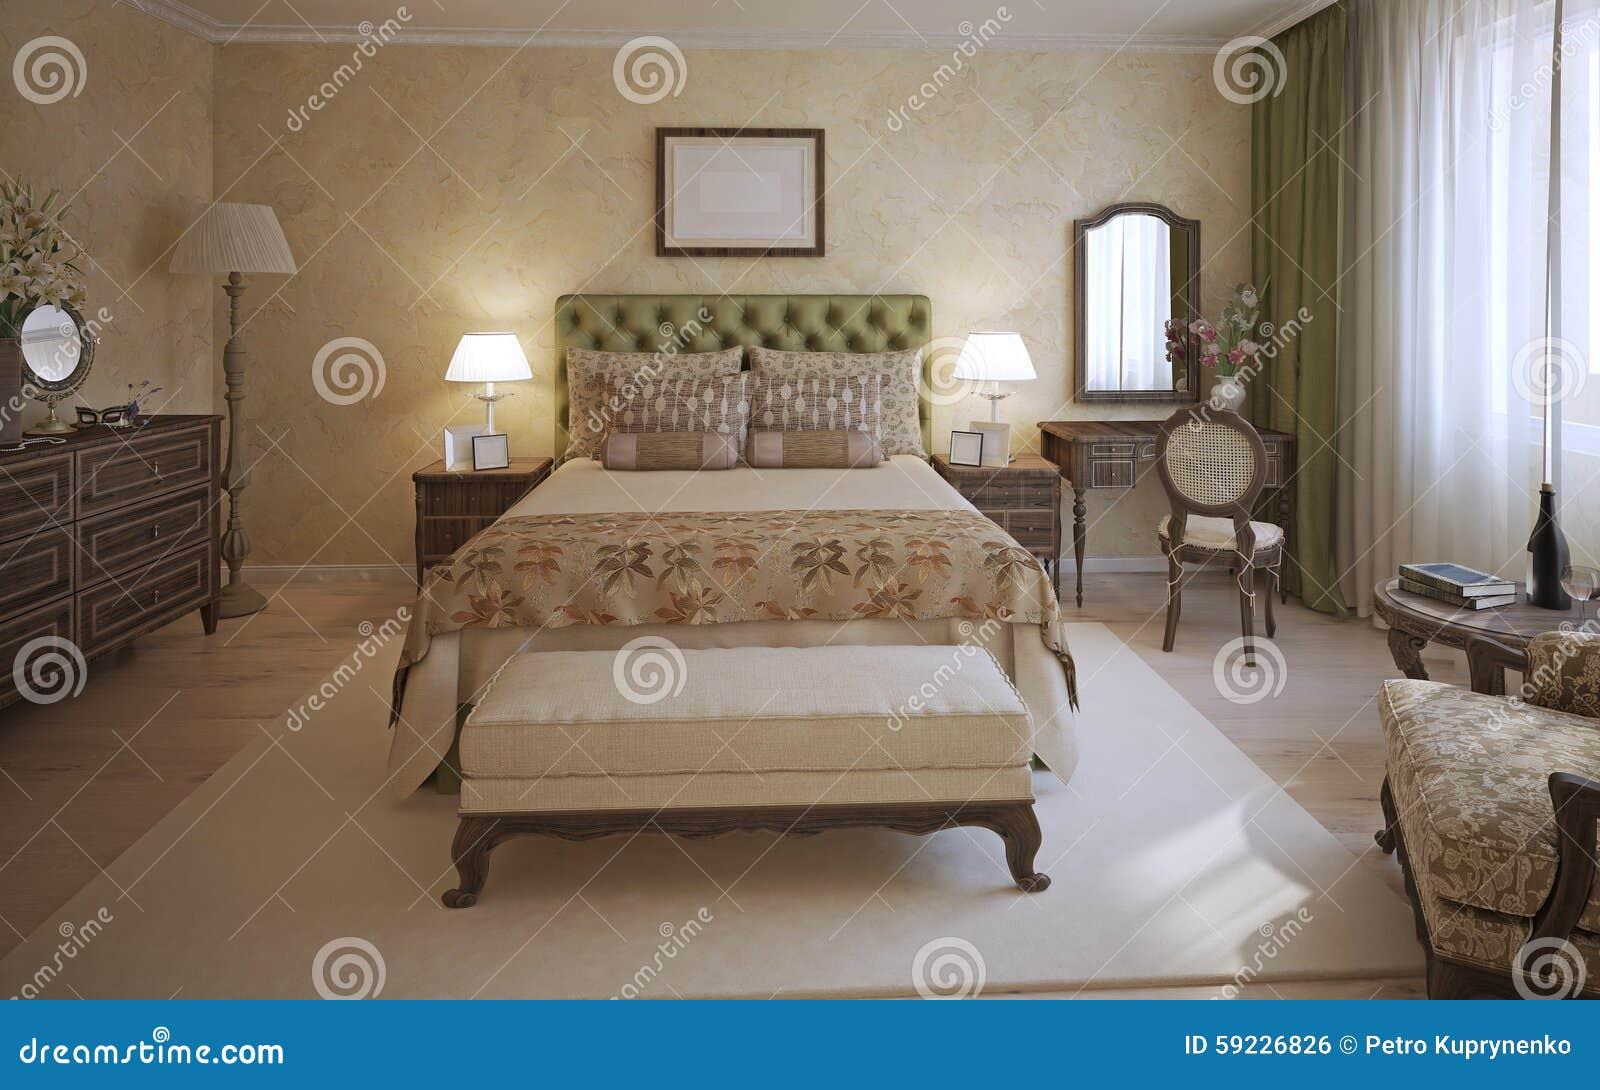 Https Www Dreamstime Com Stock Illustration Master Bedroom English Style Room Two Place Bed Olive Headboard Dark Oak Furniture Bench White Carpet Middle Image59226826